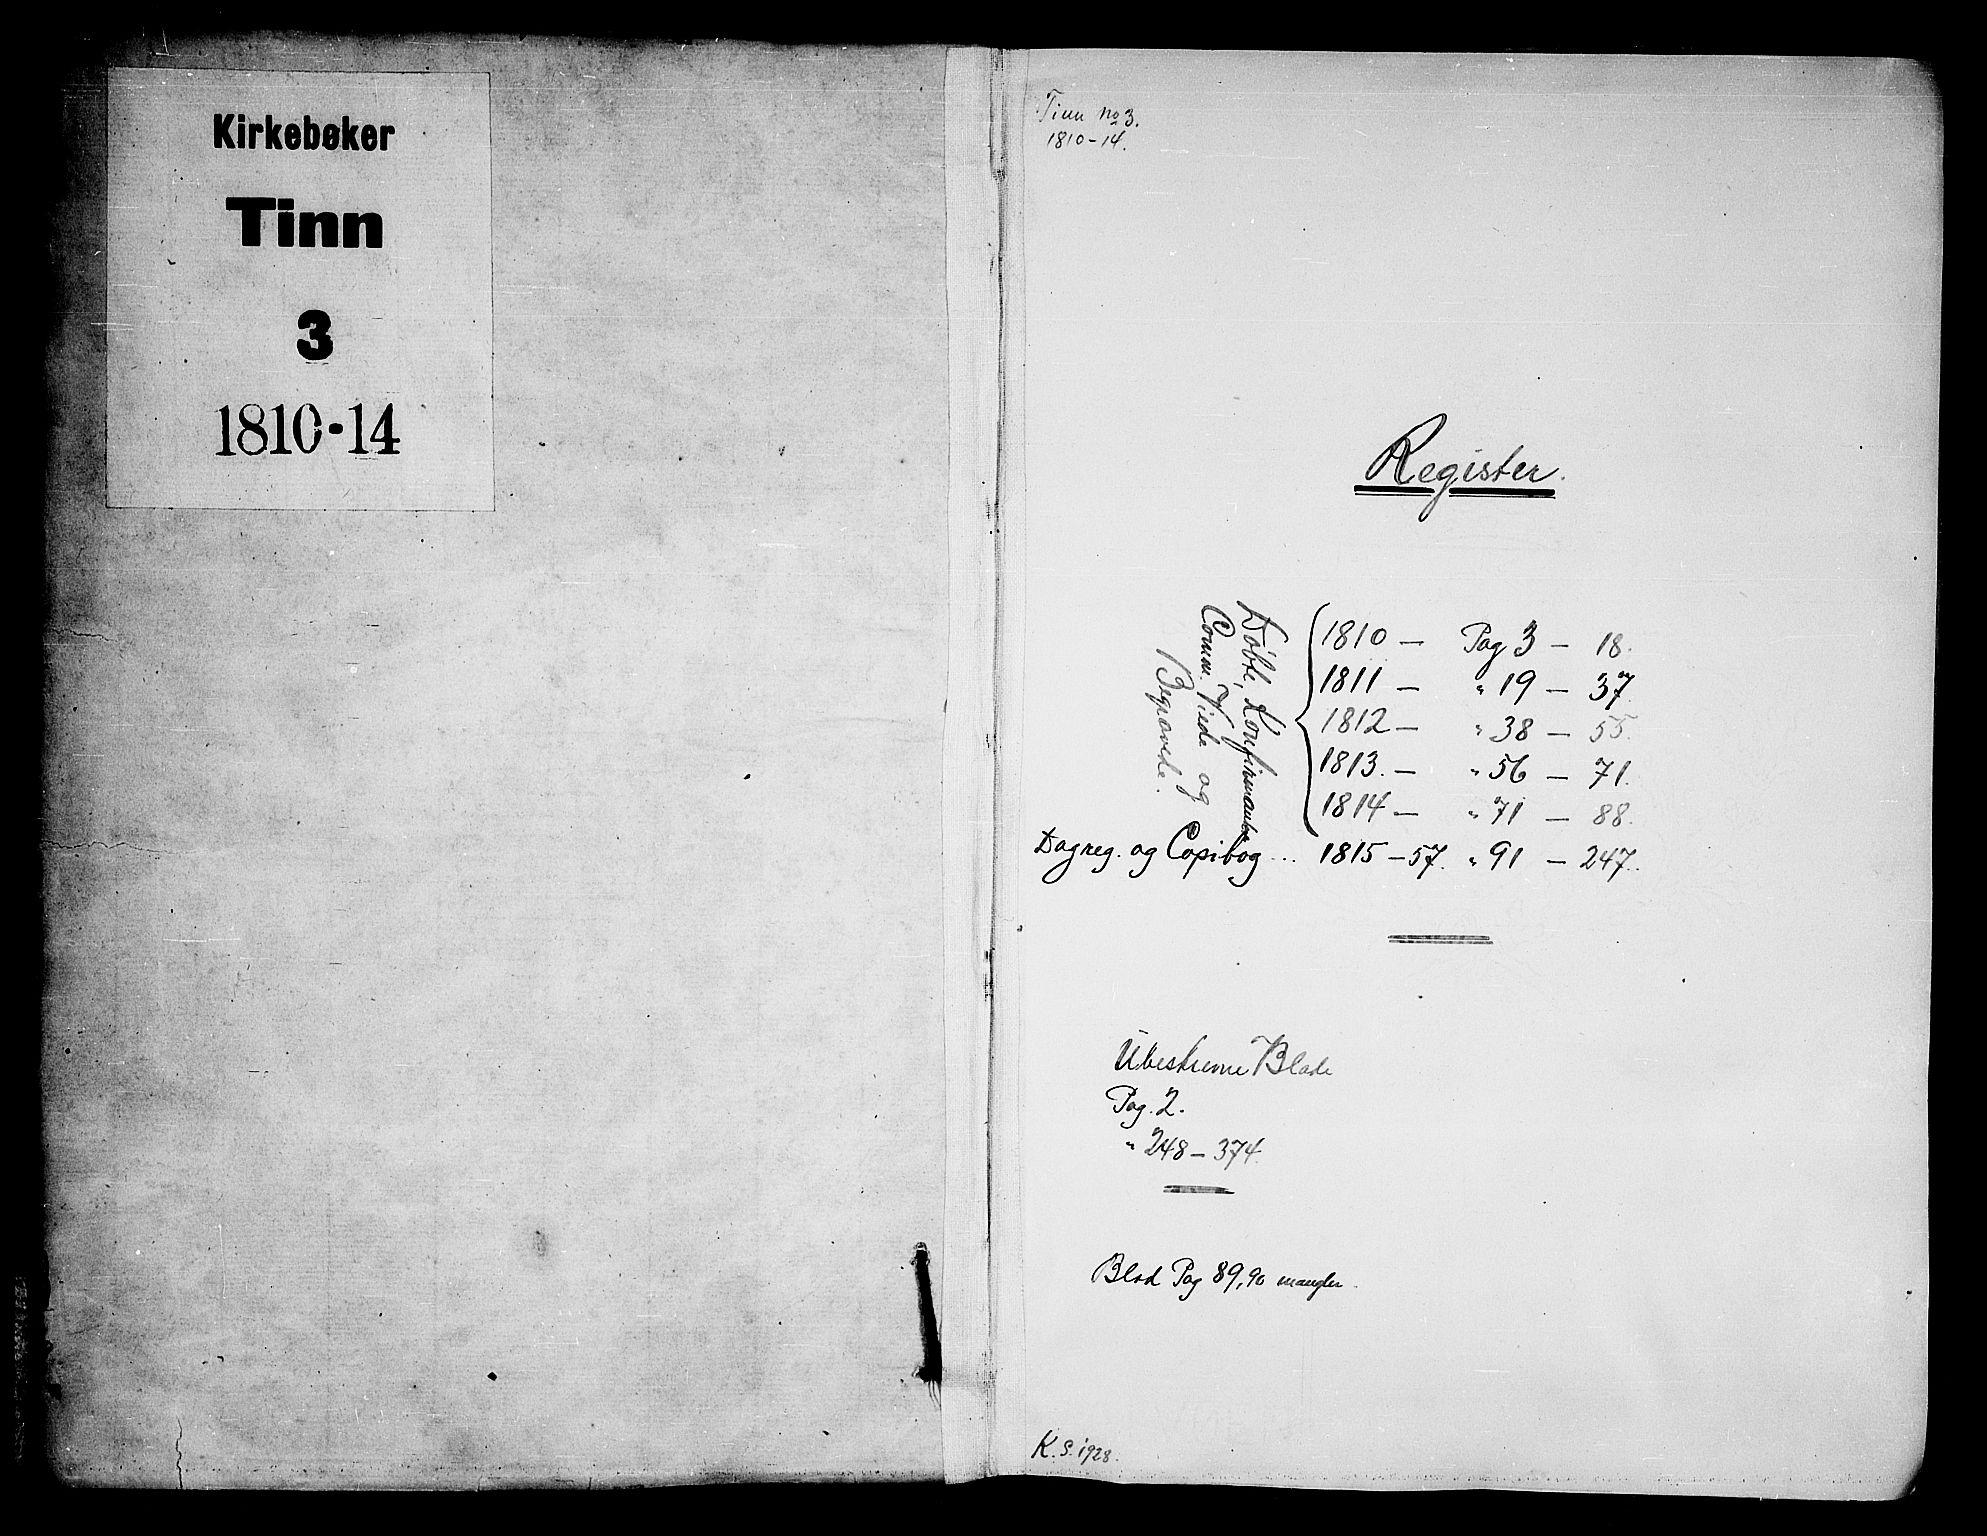 SAKO, Tinn kirkebøker, F/Fa/L0003: Ministerialbok nr. I 3, 1810-1814